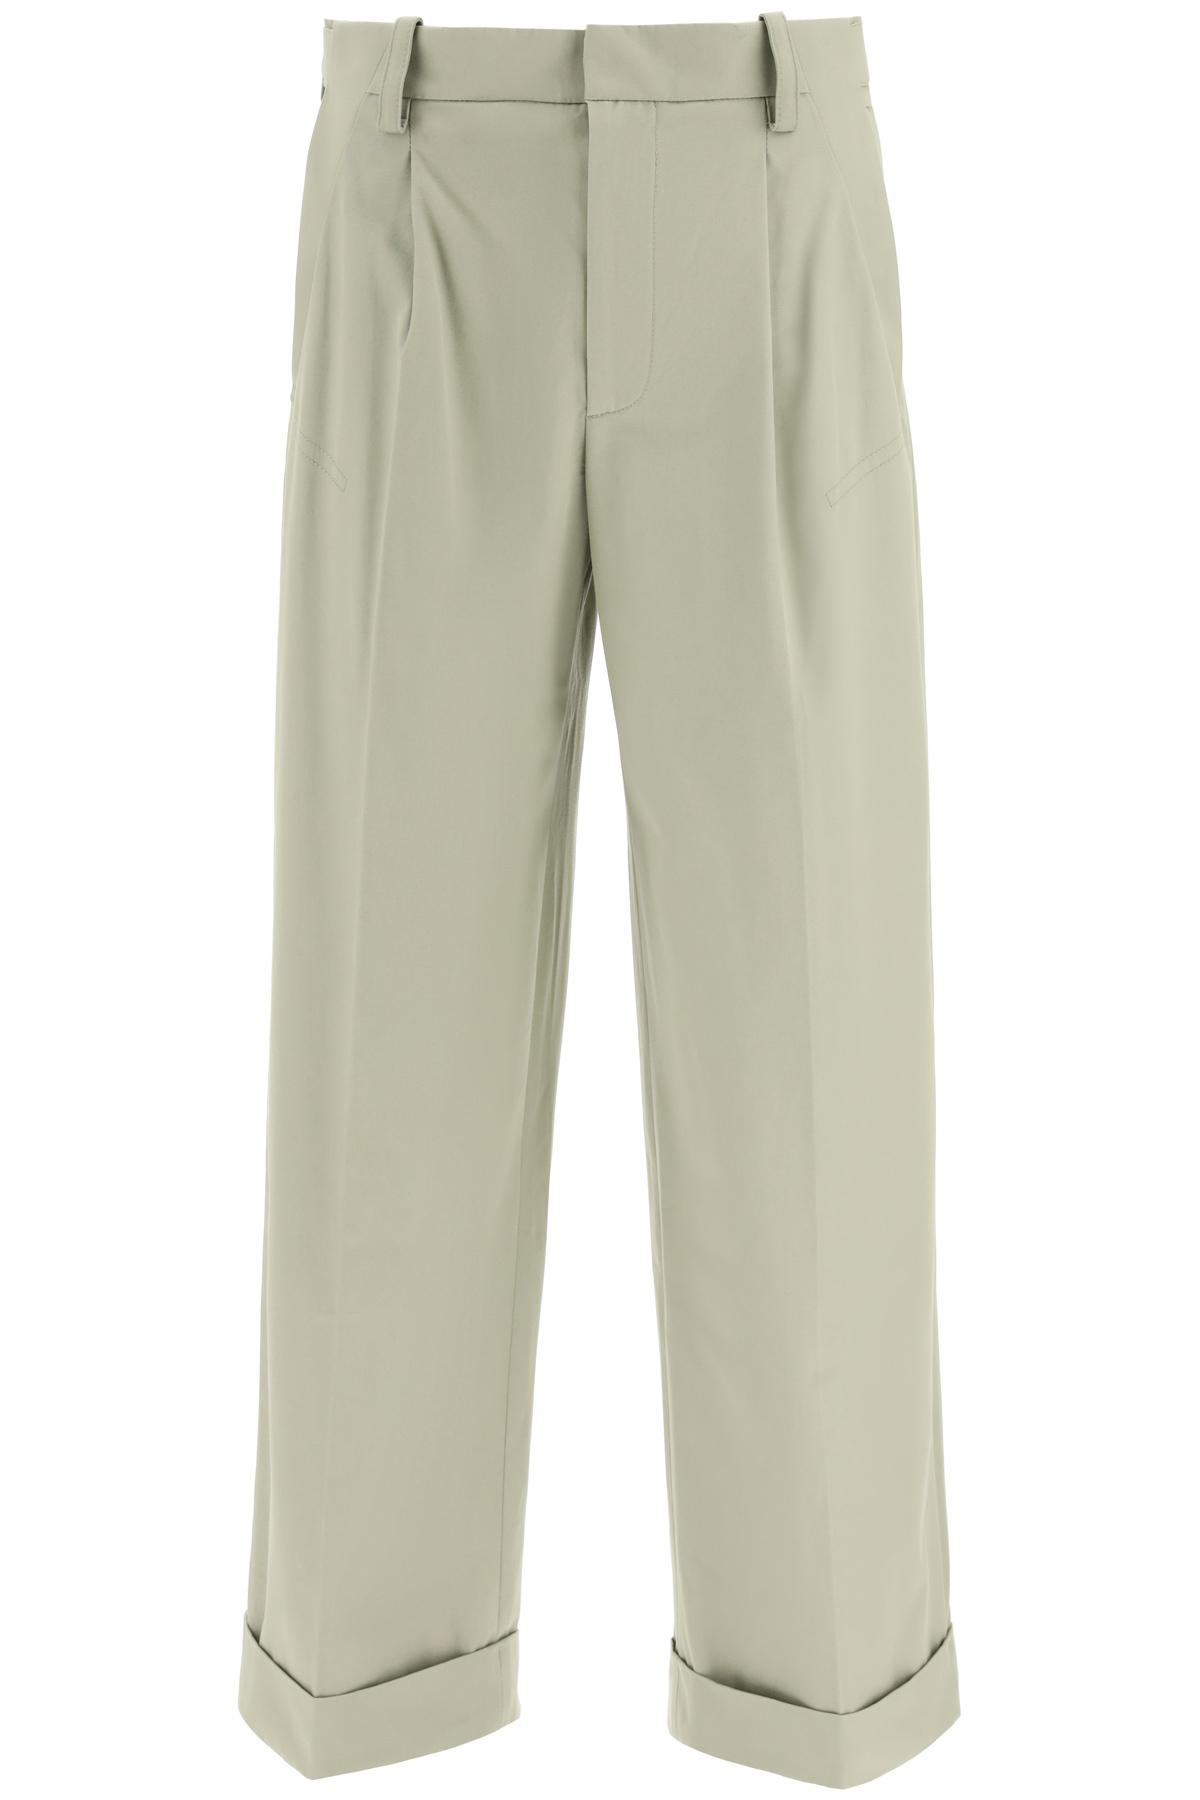 Jacquemus pantaloni novi in cotone